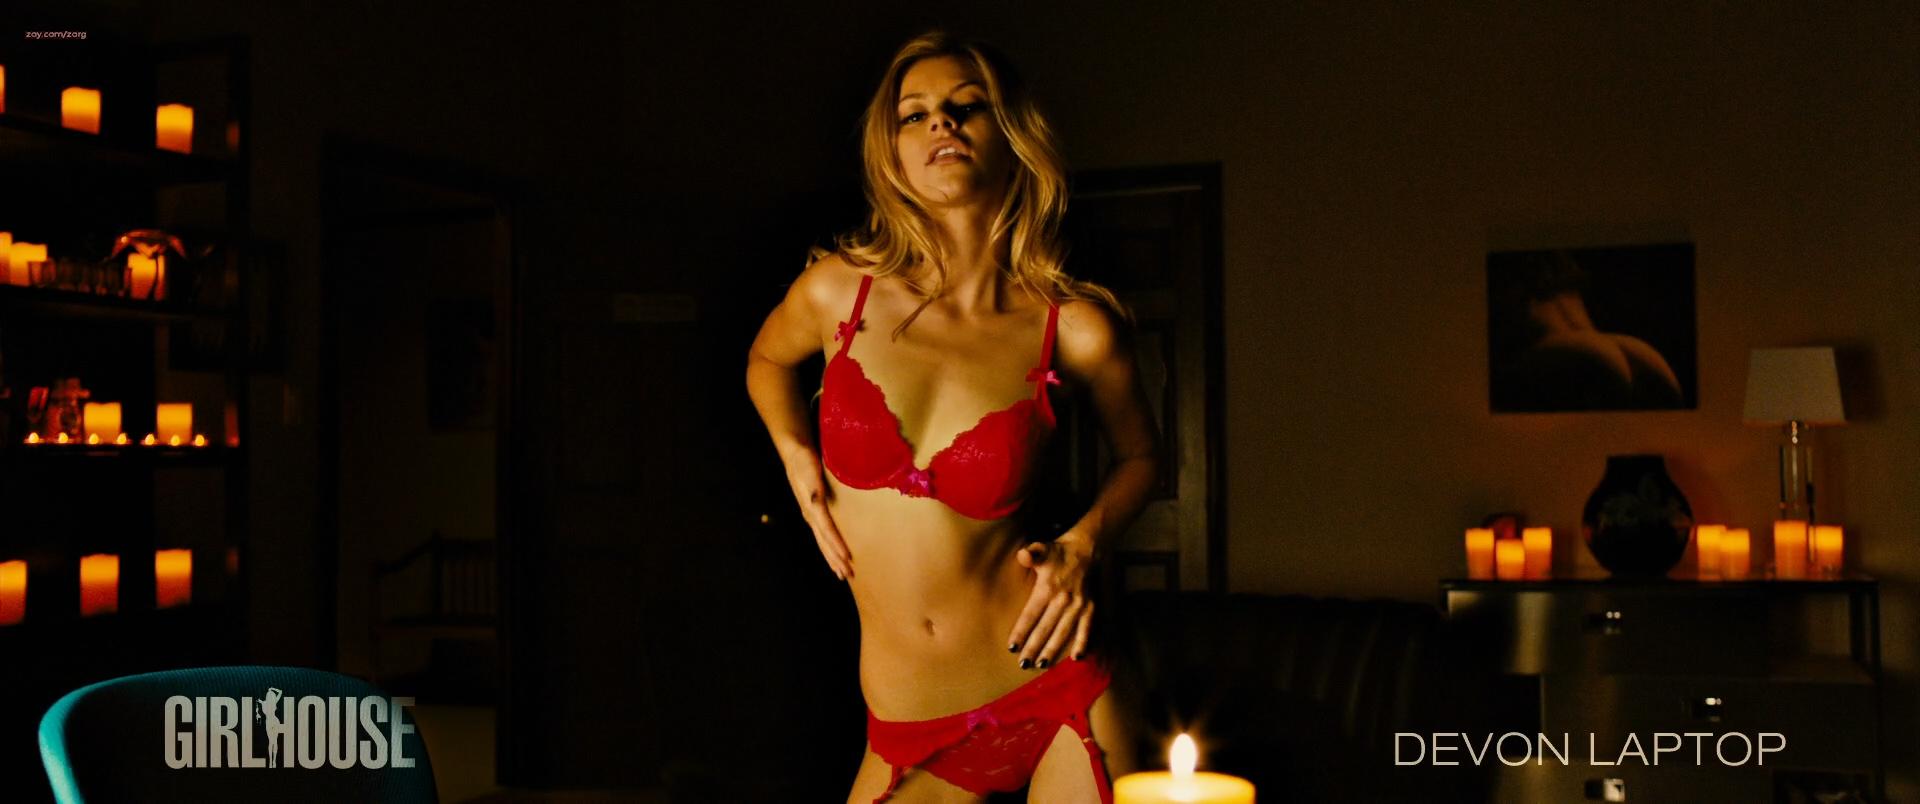 Alyson Bath hot and sexy - Girlhouse (2014) HD 1080p Web-Dl (9)